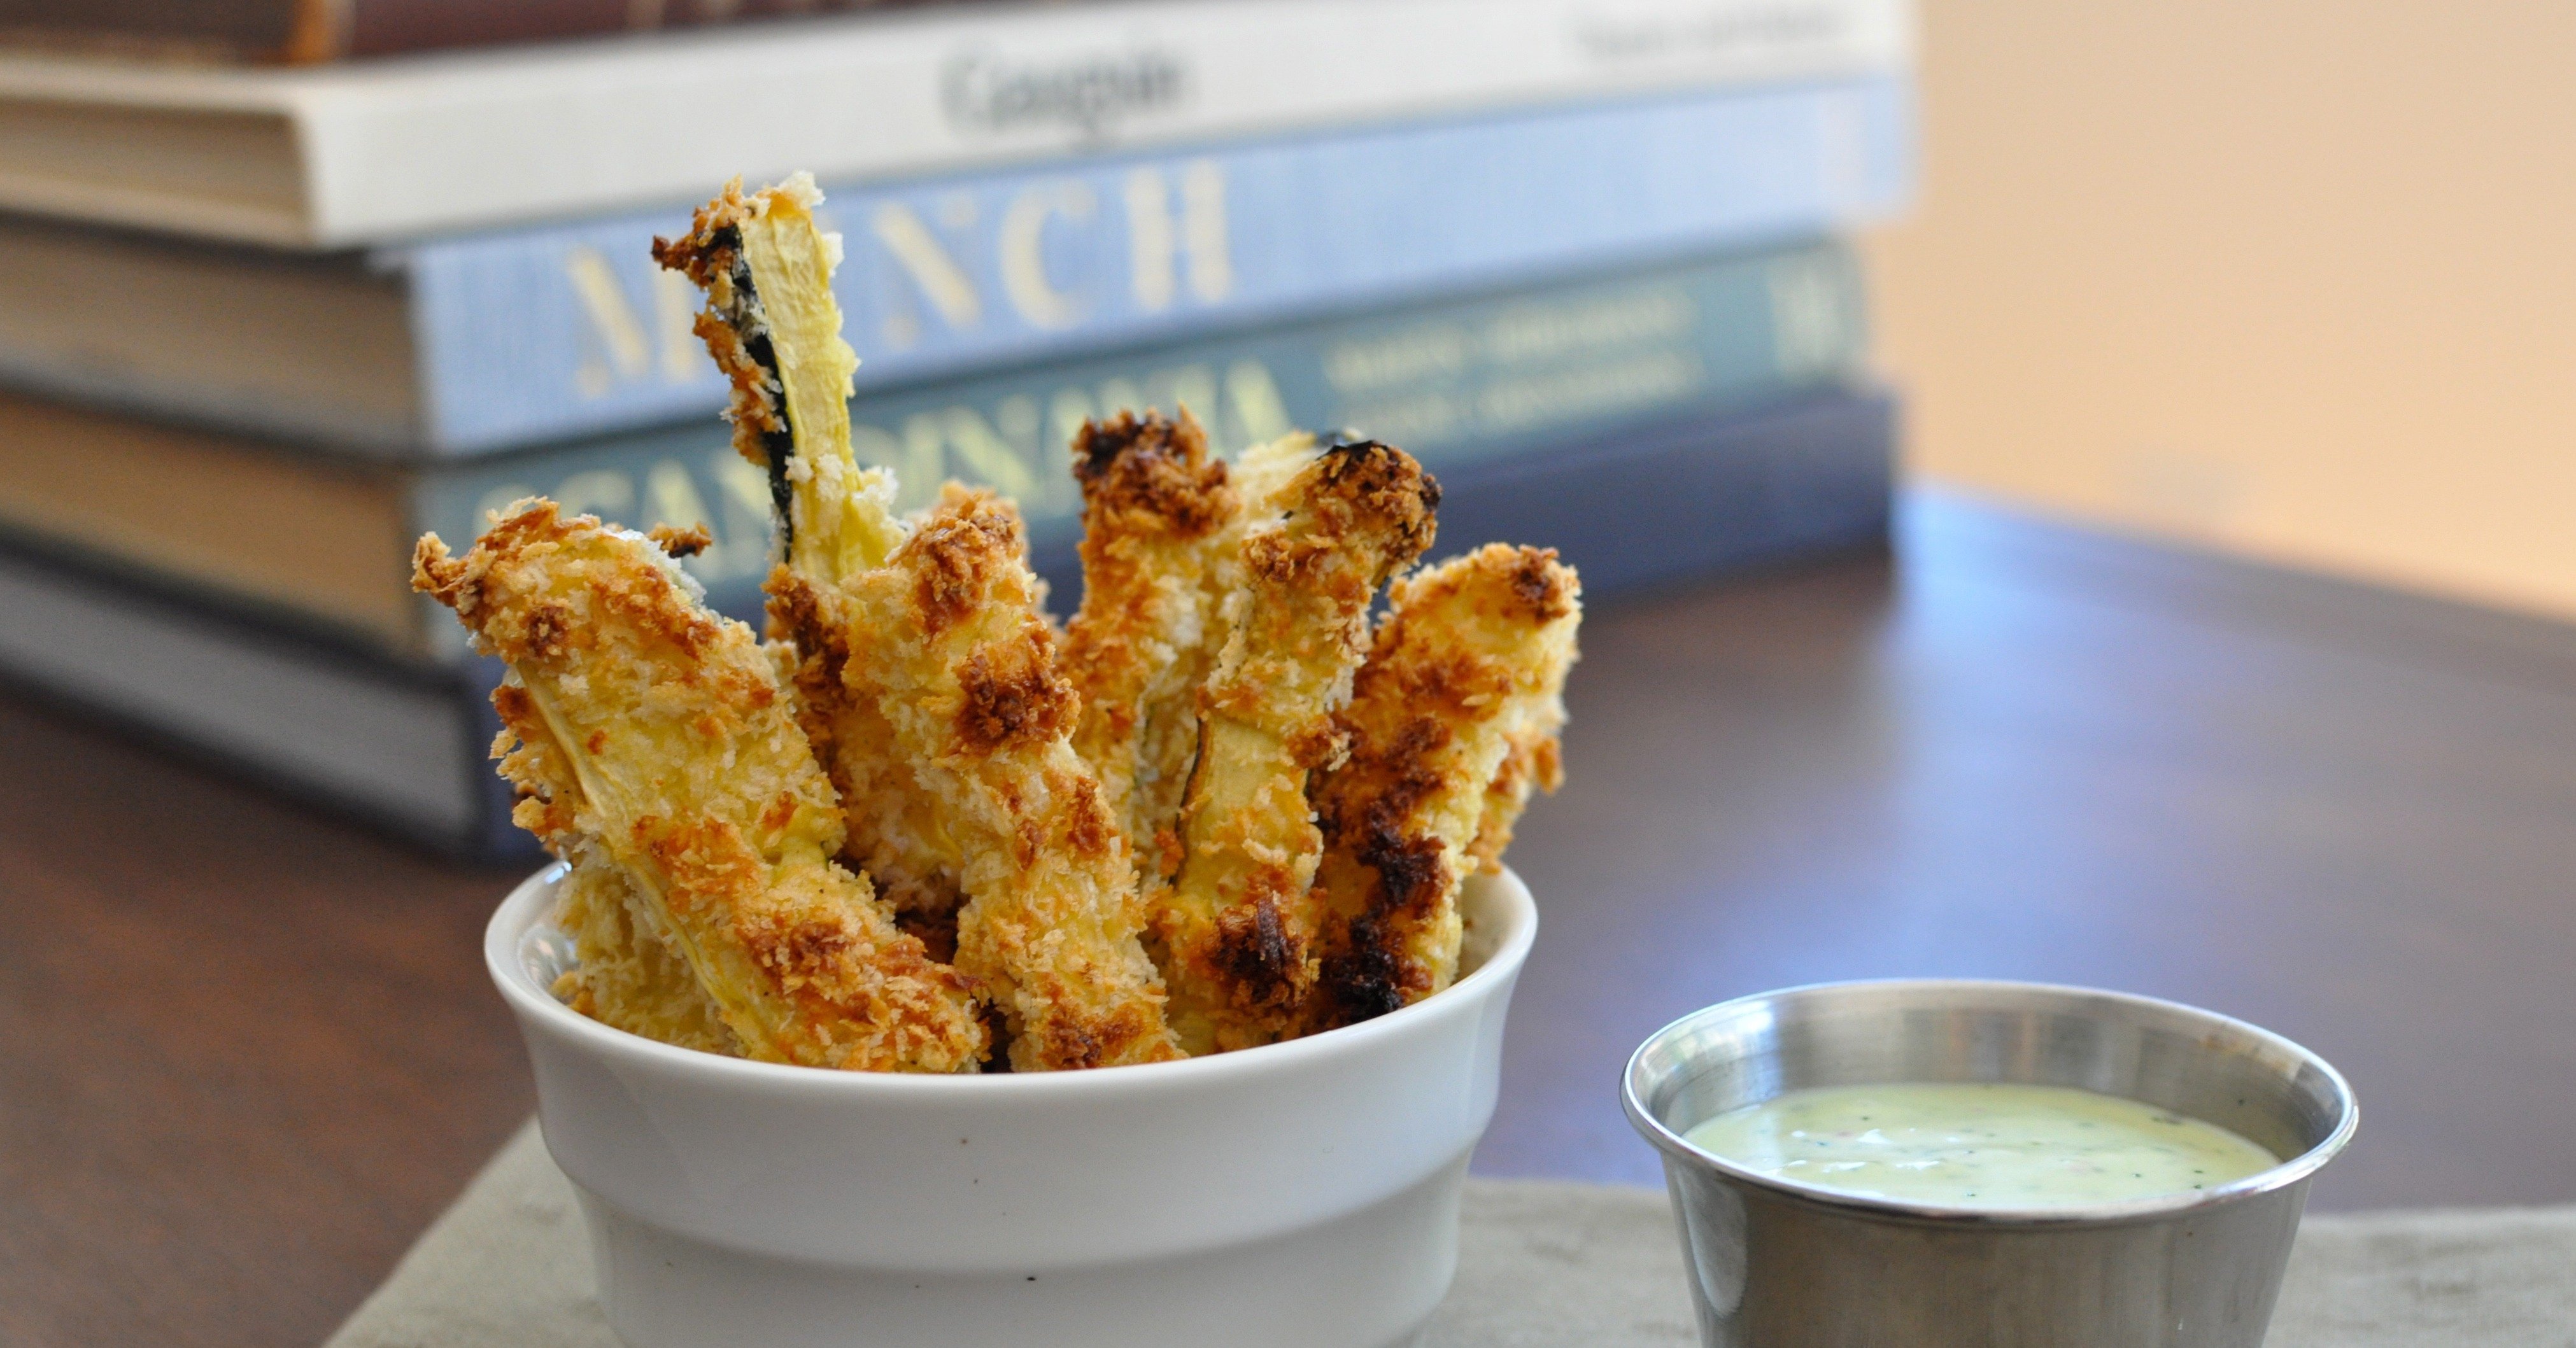 Zucchini Fries With Buttermilk Ranch Dip | 40 Killer ...